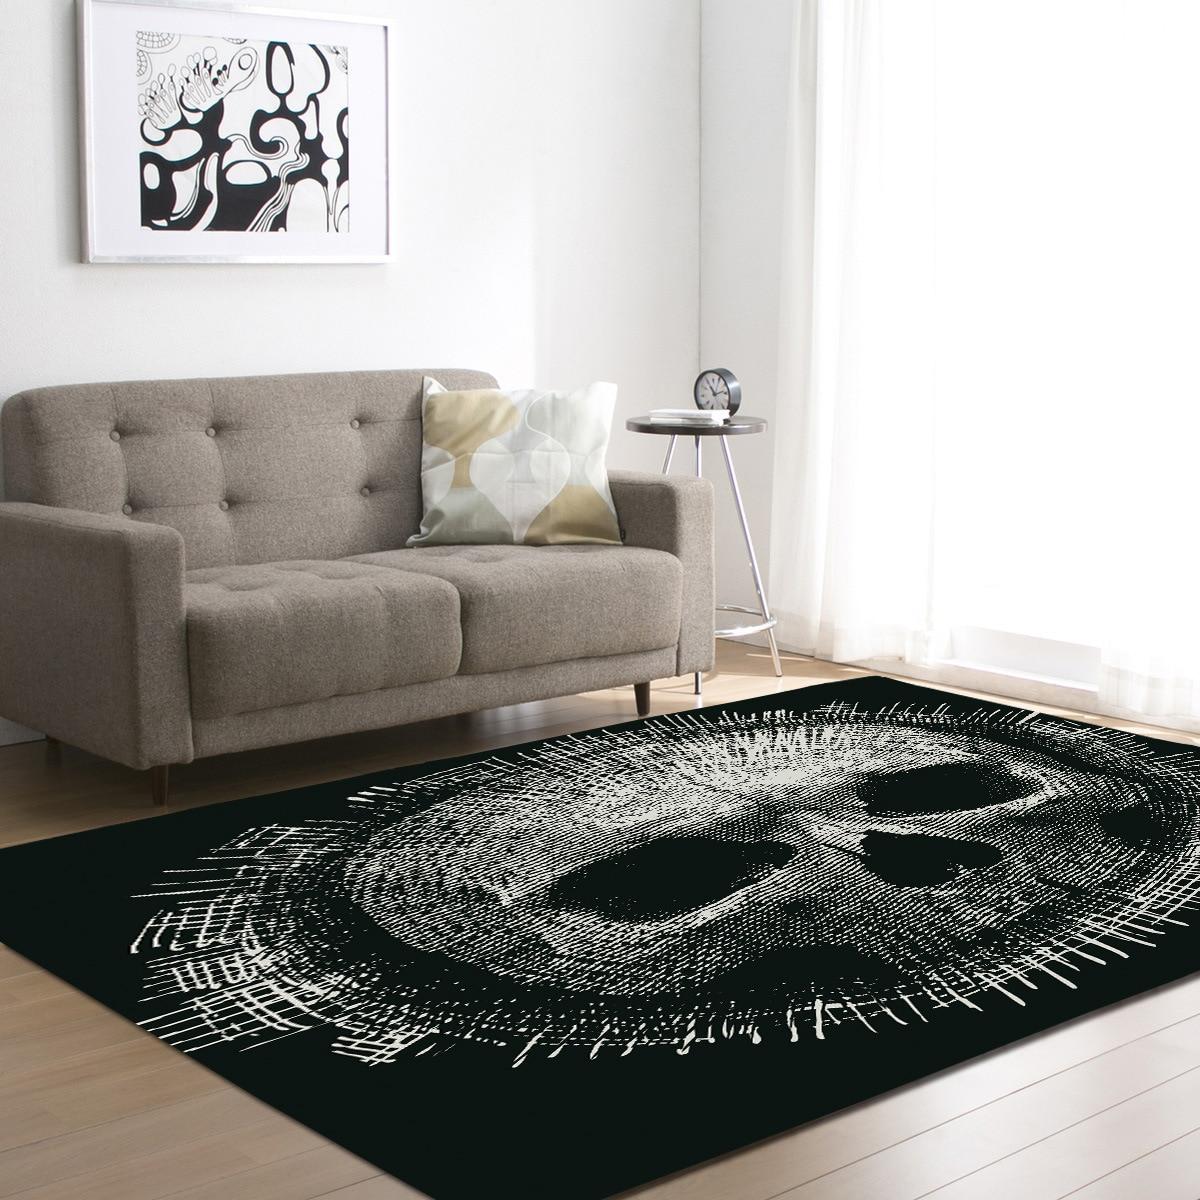 DeMissir 3D crâne imprimer grand tapis pour salon antidérapant chambre tapis tapete para sala tapetes tapis vloerkleed teppich